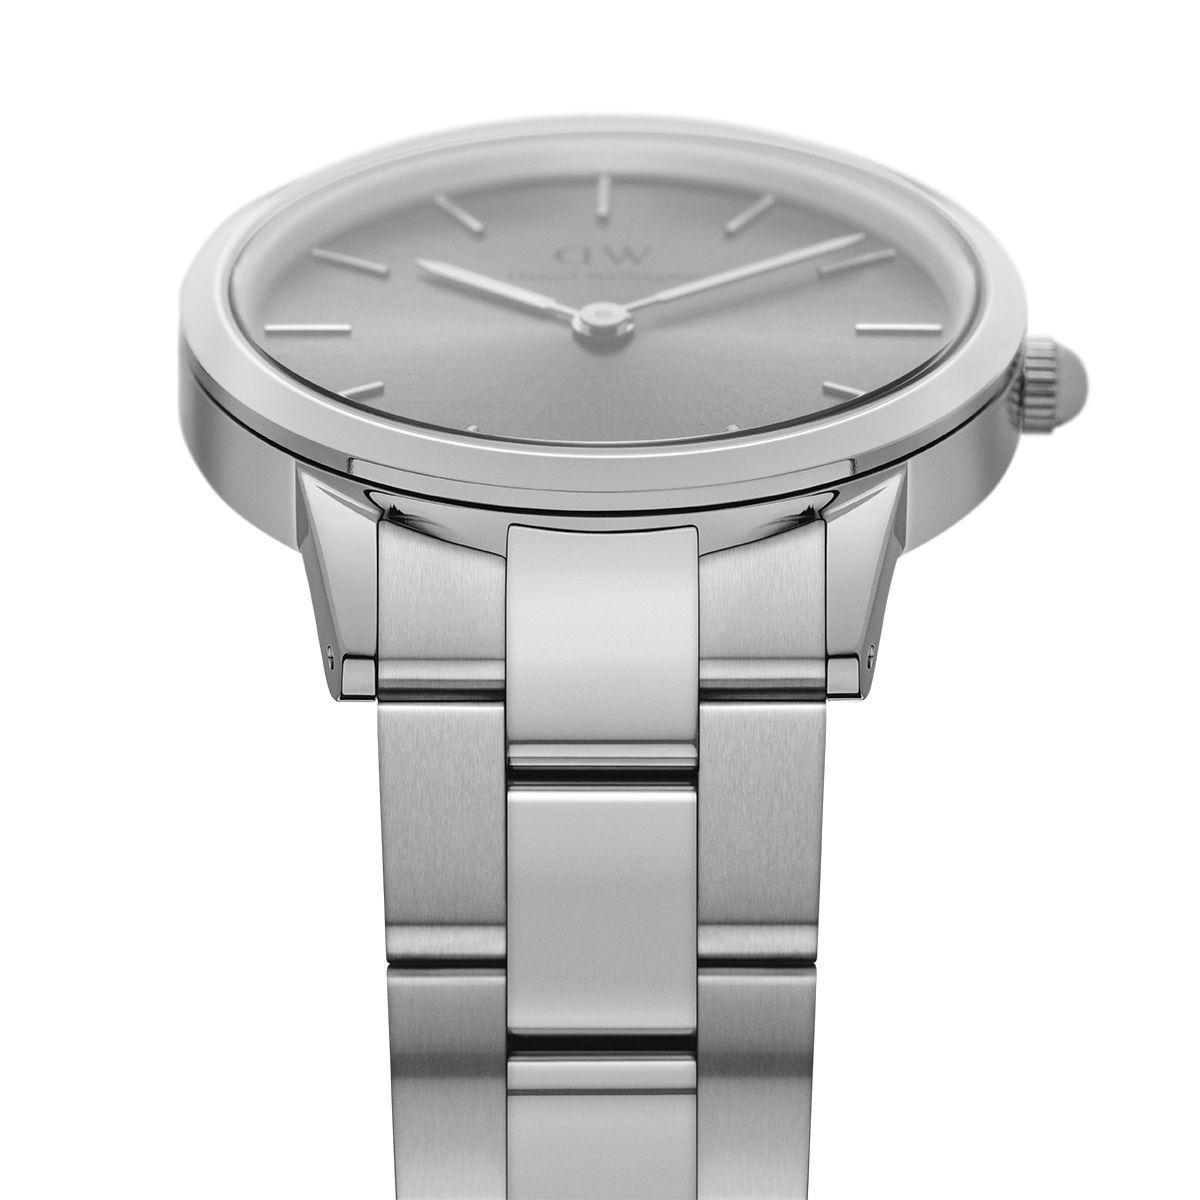 dw官网 dw手表官网 dw中国官网 dw官方旗舰店 DW DW官网  Watch Iconic Link Silver Grey 28mm